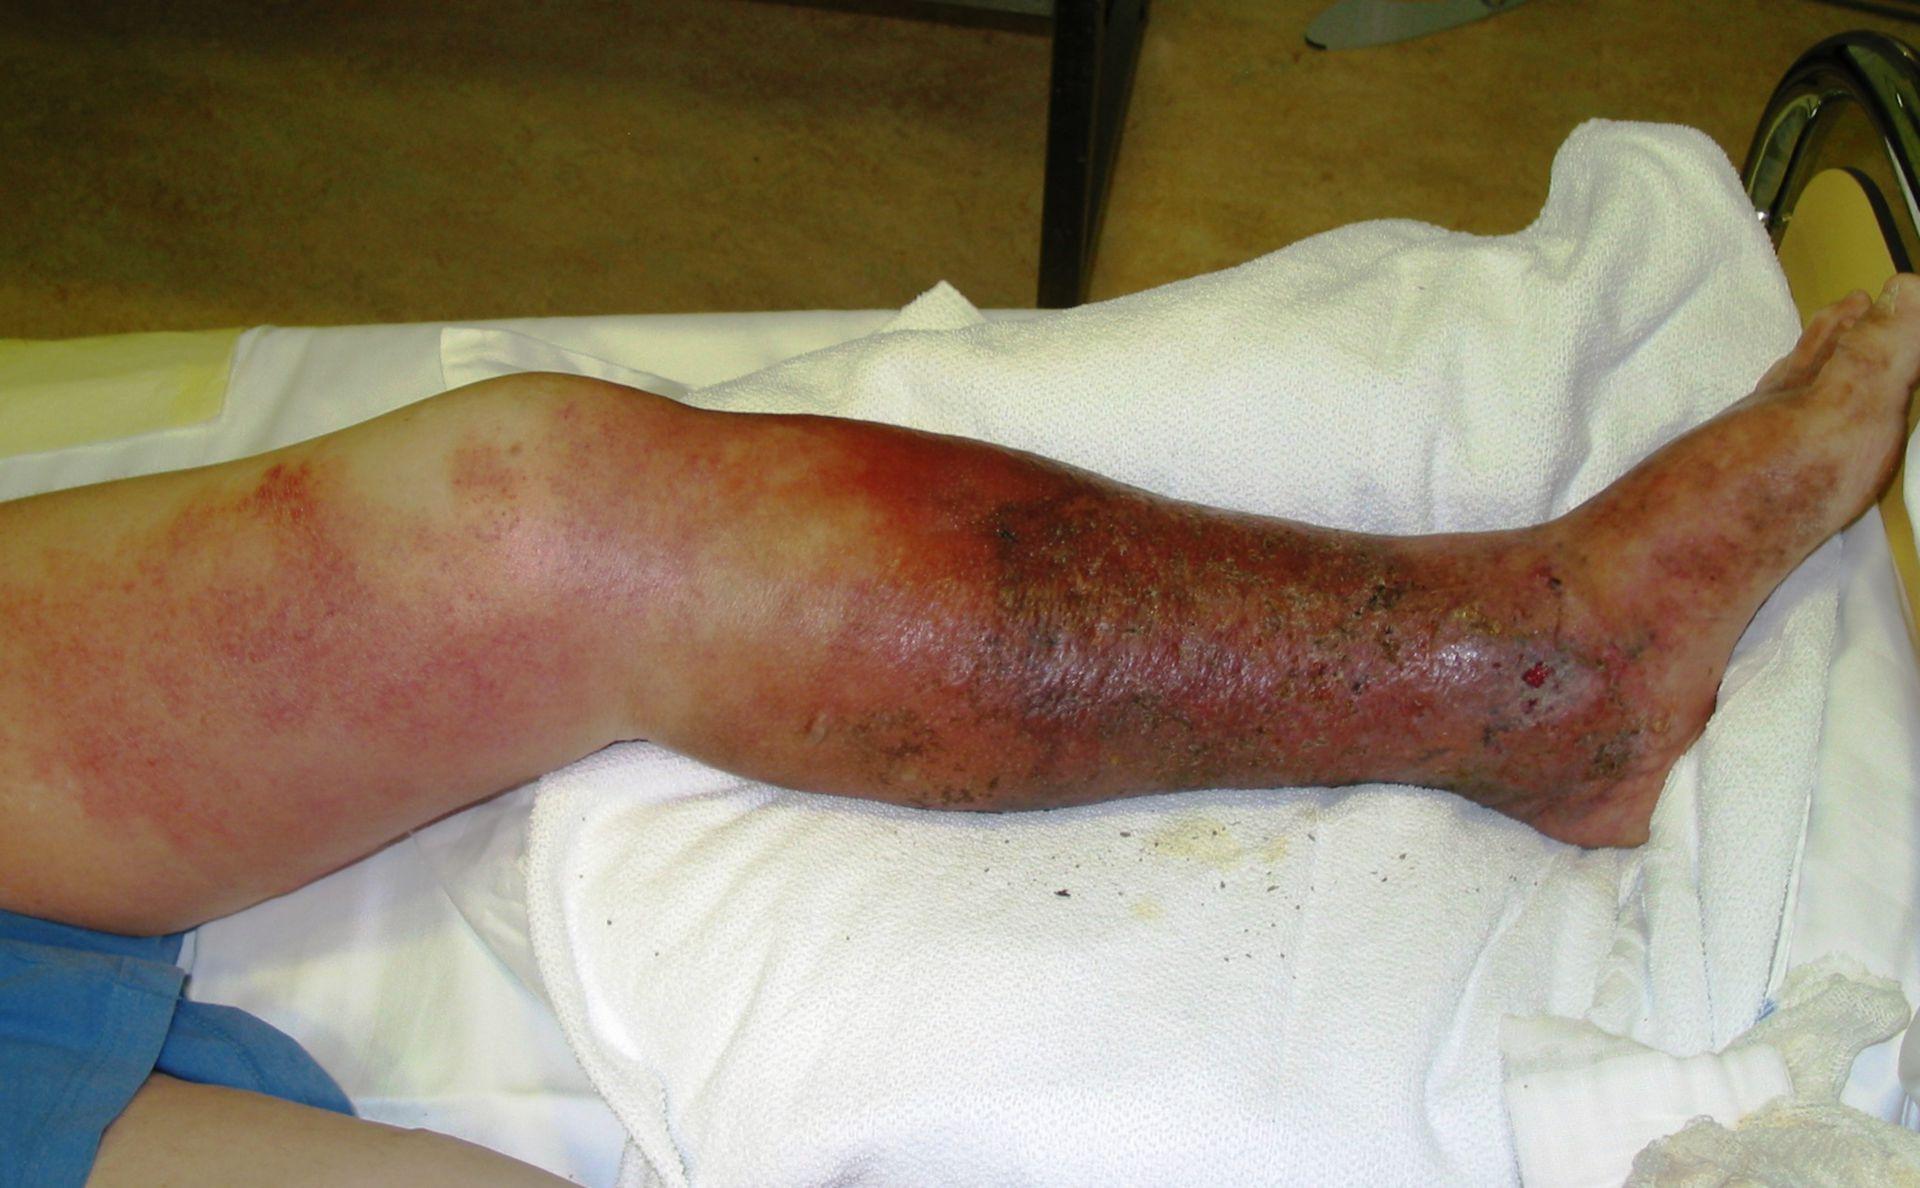 Ulcera crural - Insuficiencia venosa crónica - Erisipela